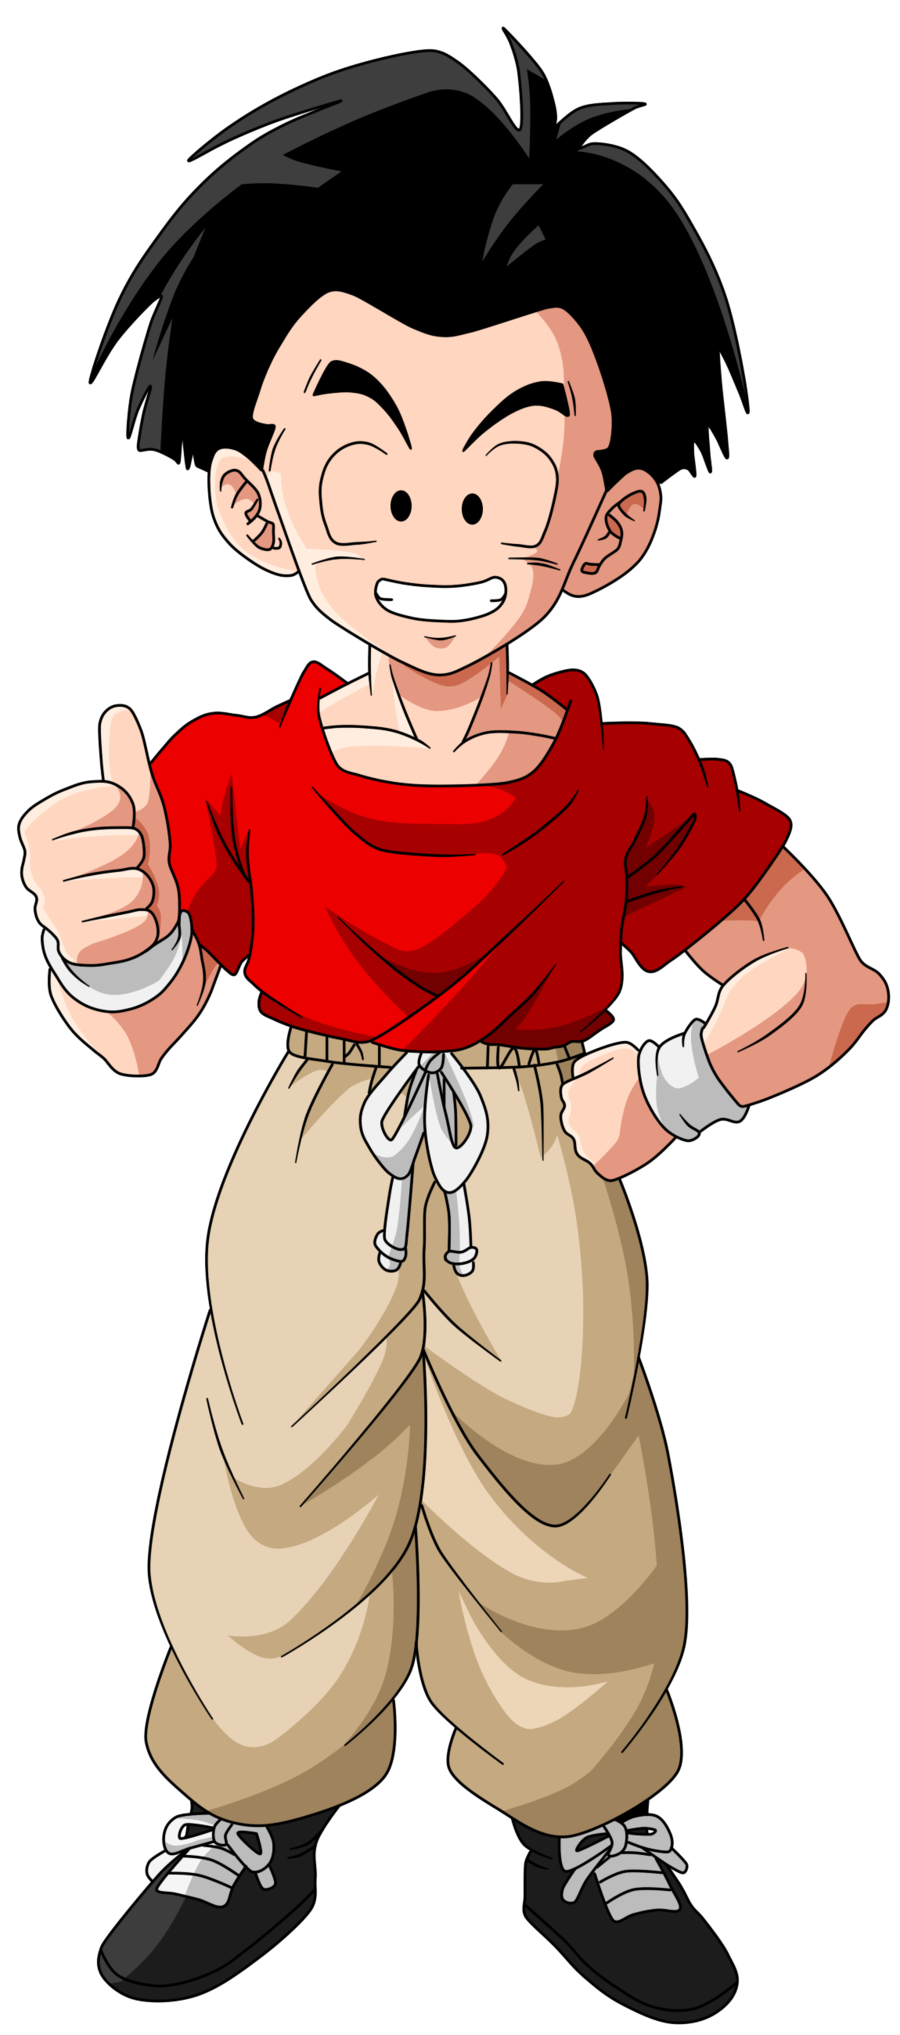 Krillen 3 Anime Dragon Ball Dragon Ball Dragon Ball Z